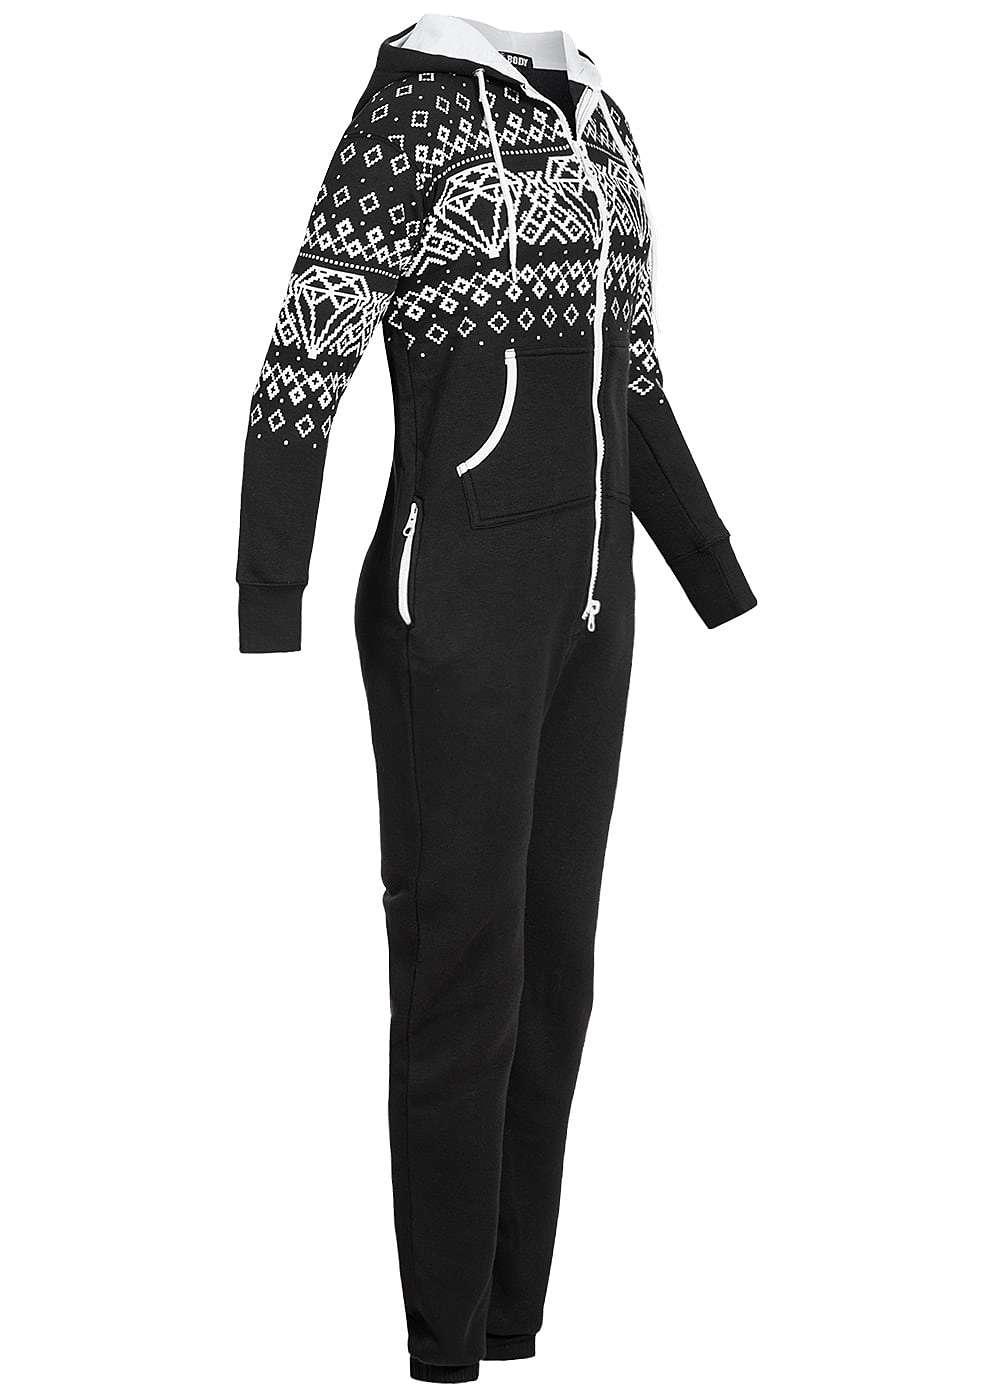 seventyseven lifestyle damen jumpsuit kapuze kontrastzipper 4 taschen schwarz diamond 77onlineshop. Black Bedroom Furniture Sets. Home Design Ideas